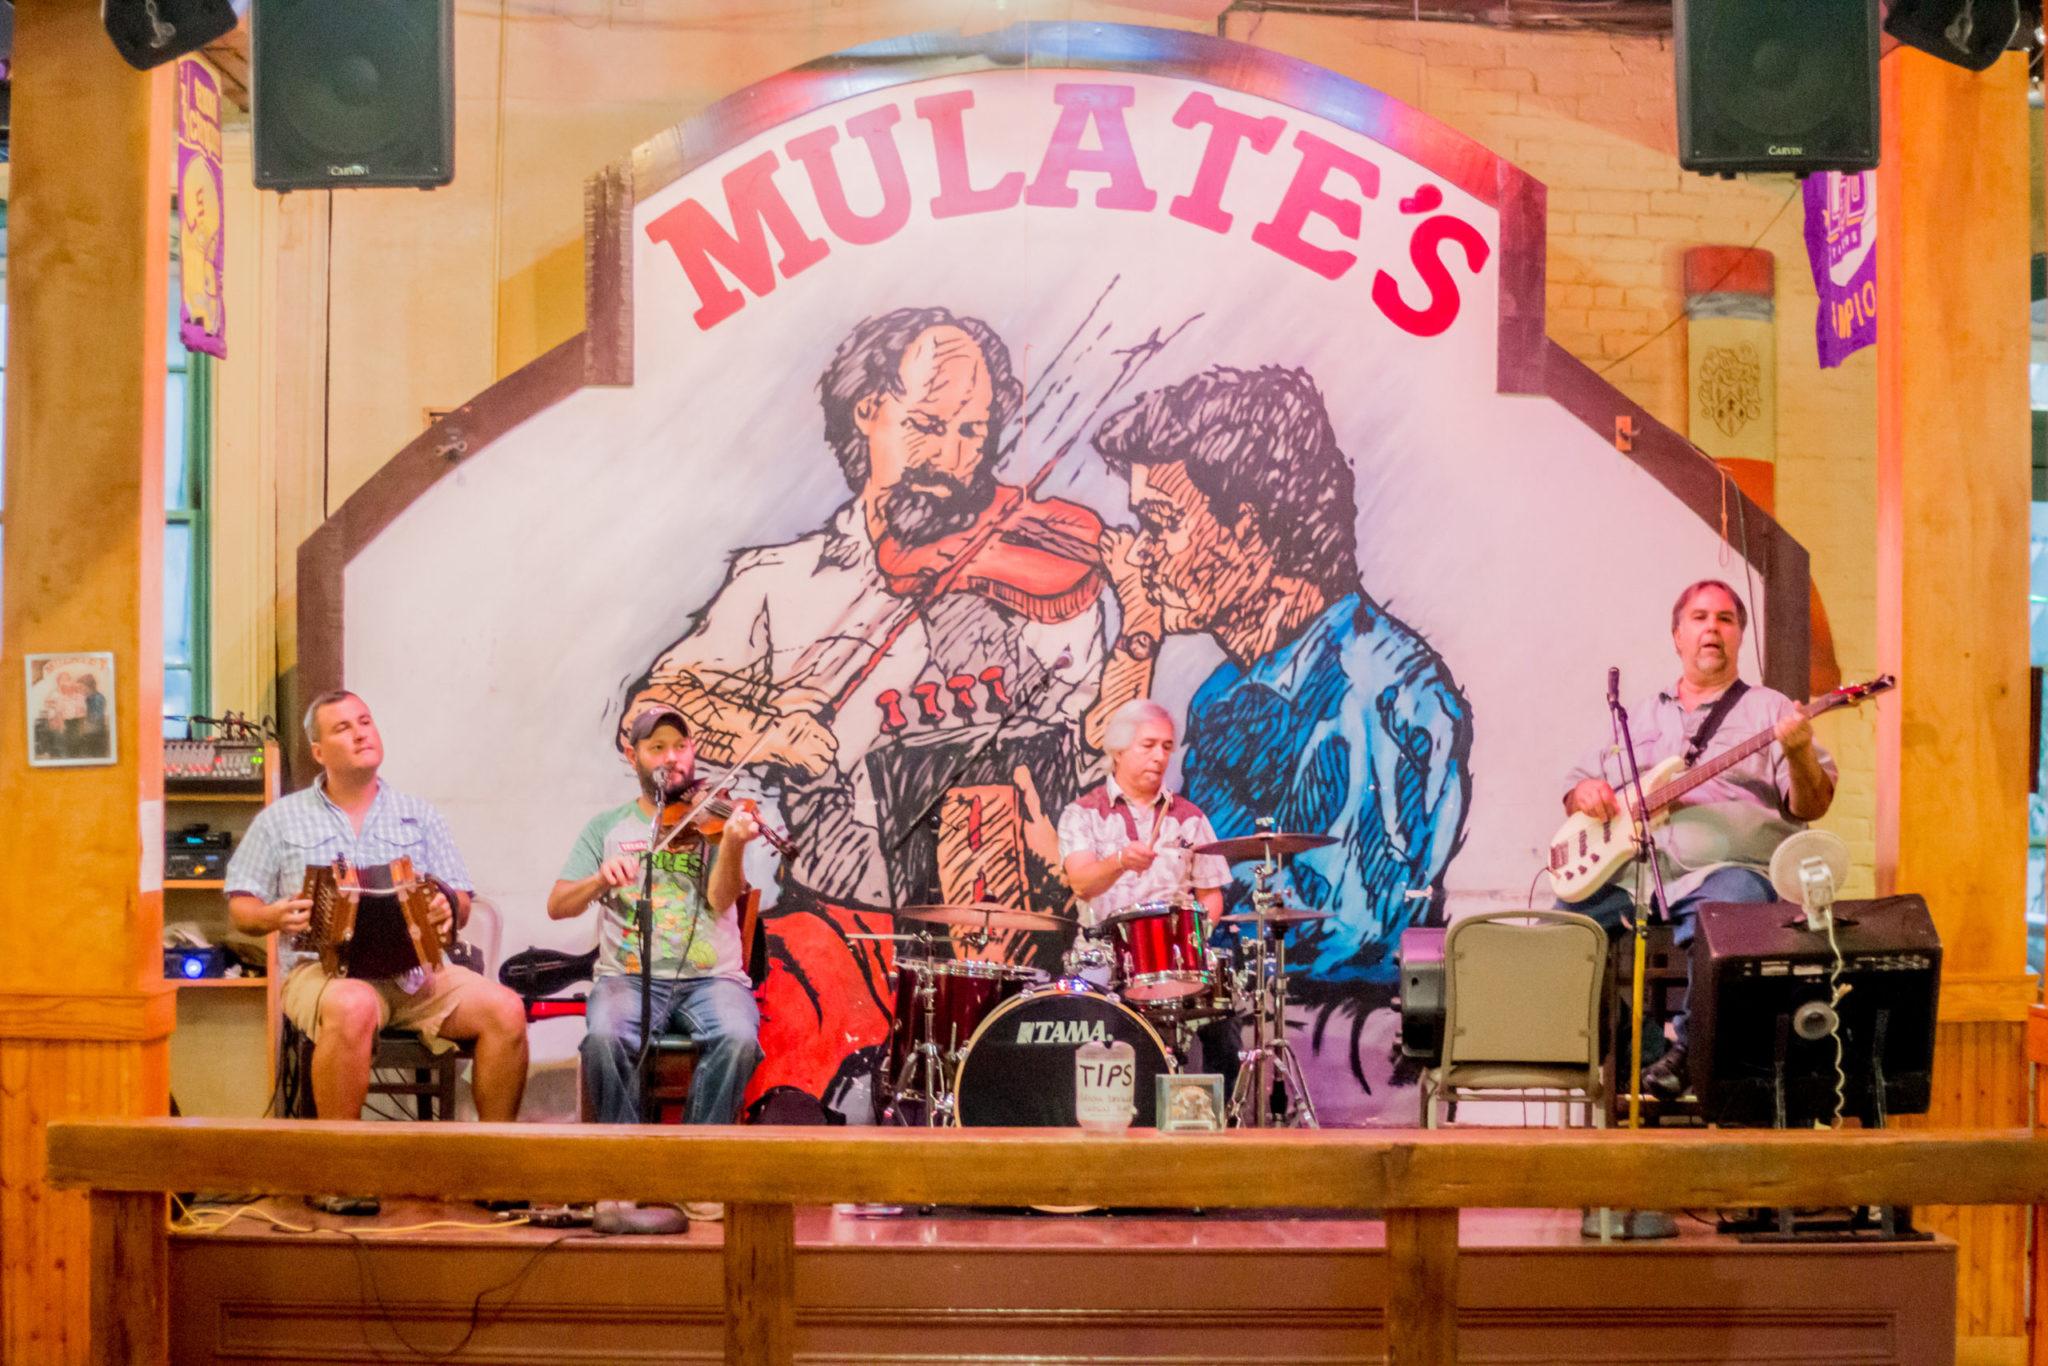 Mulates